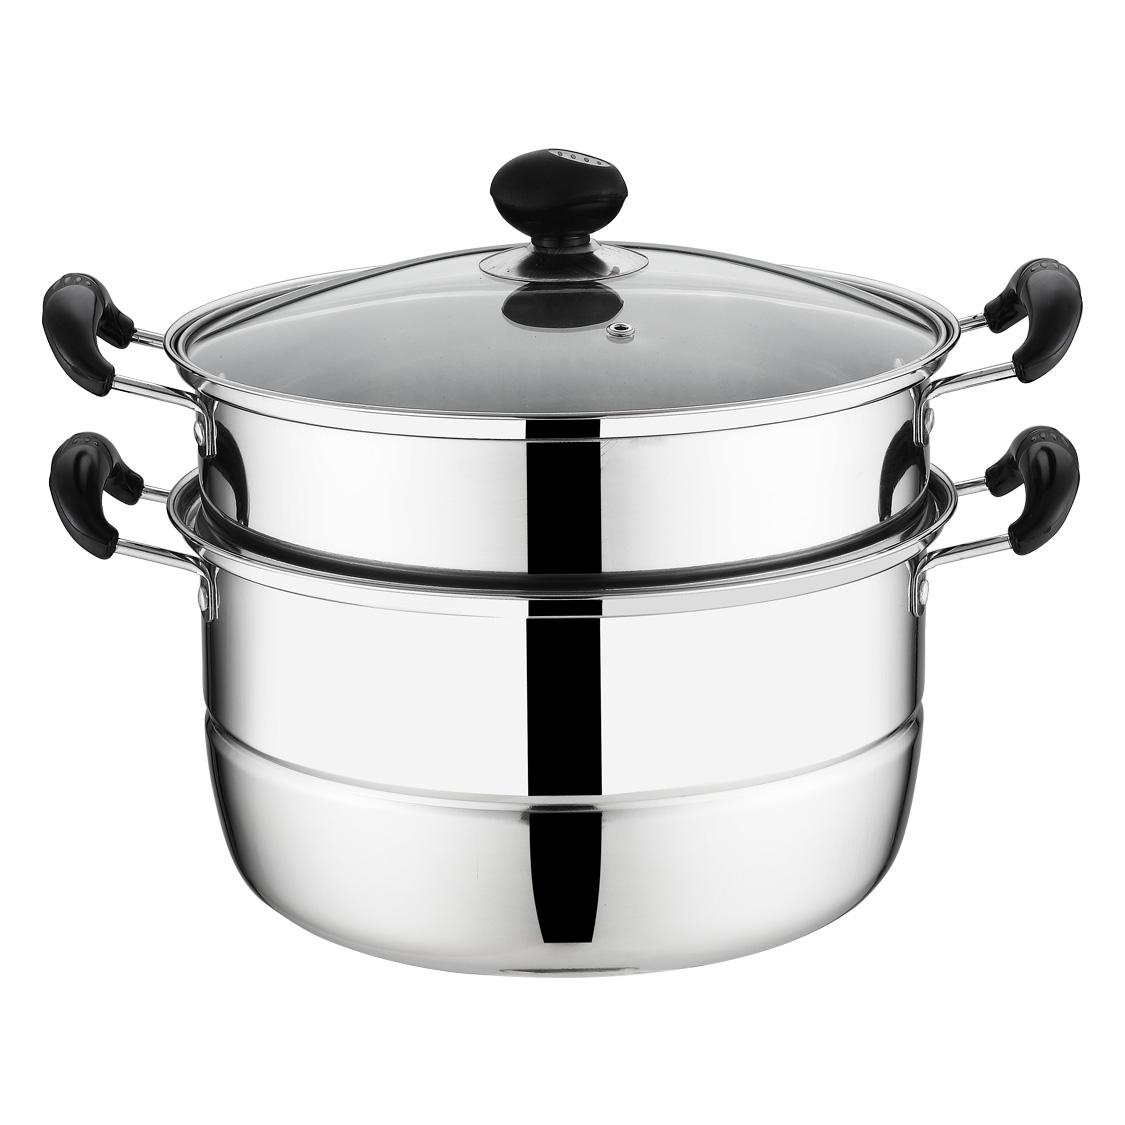 26cm430不锈钢蒸锅